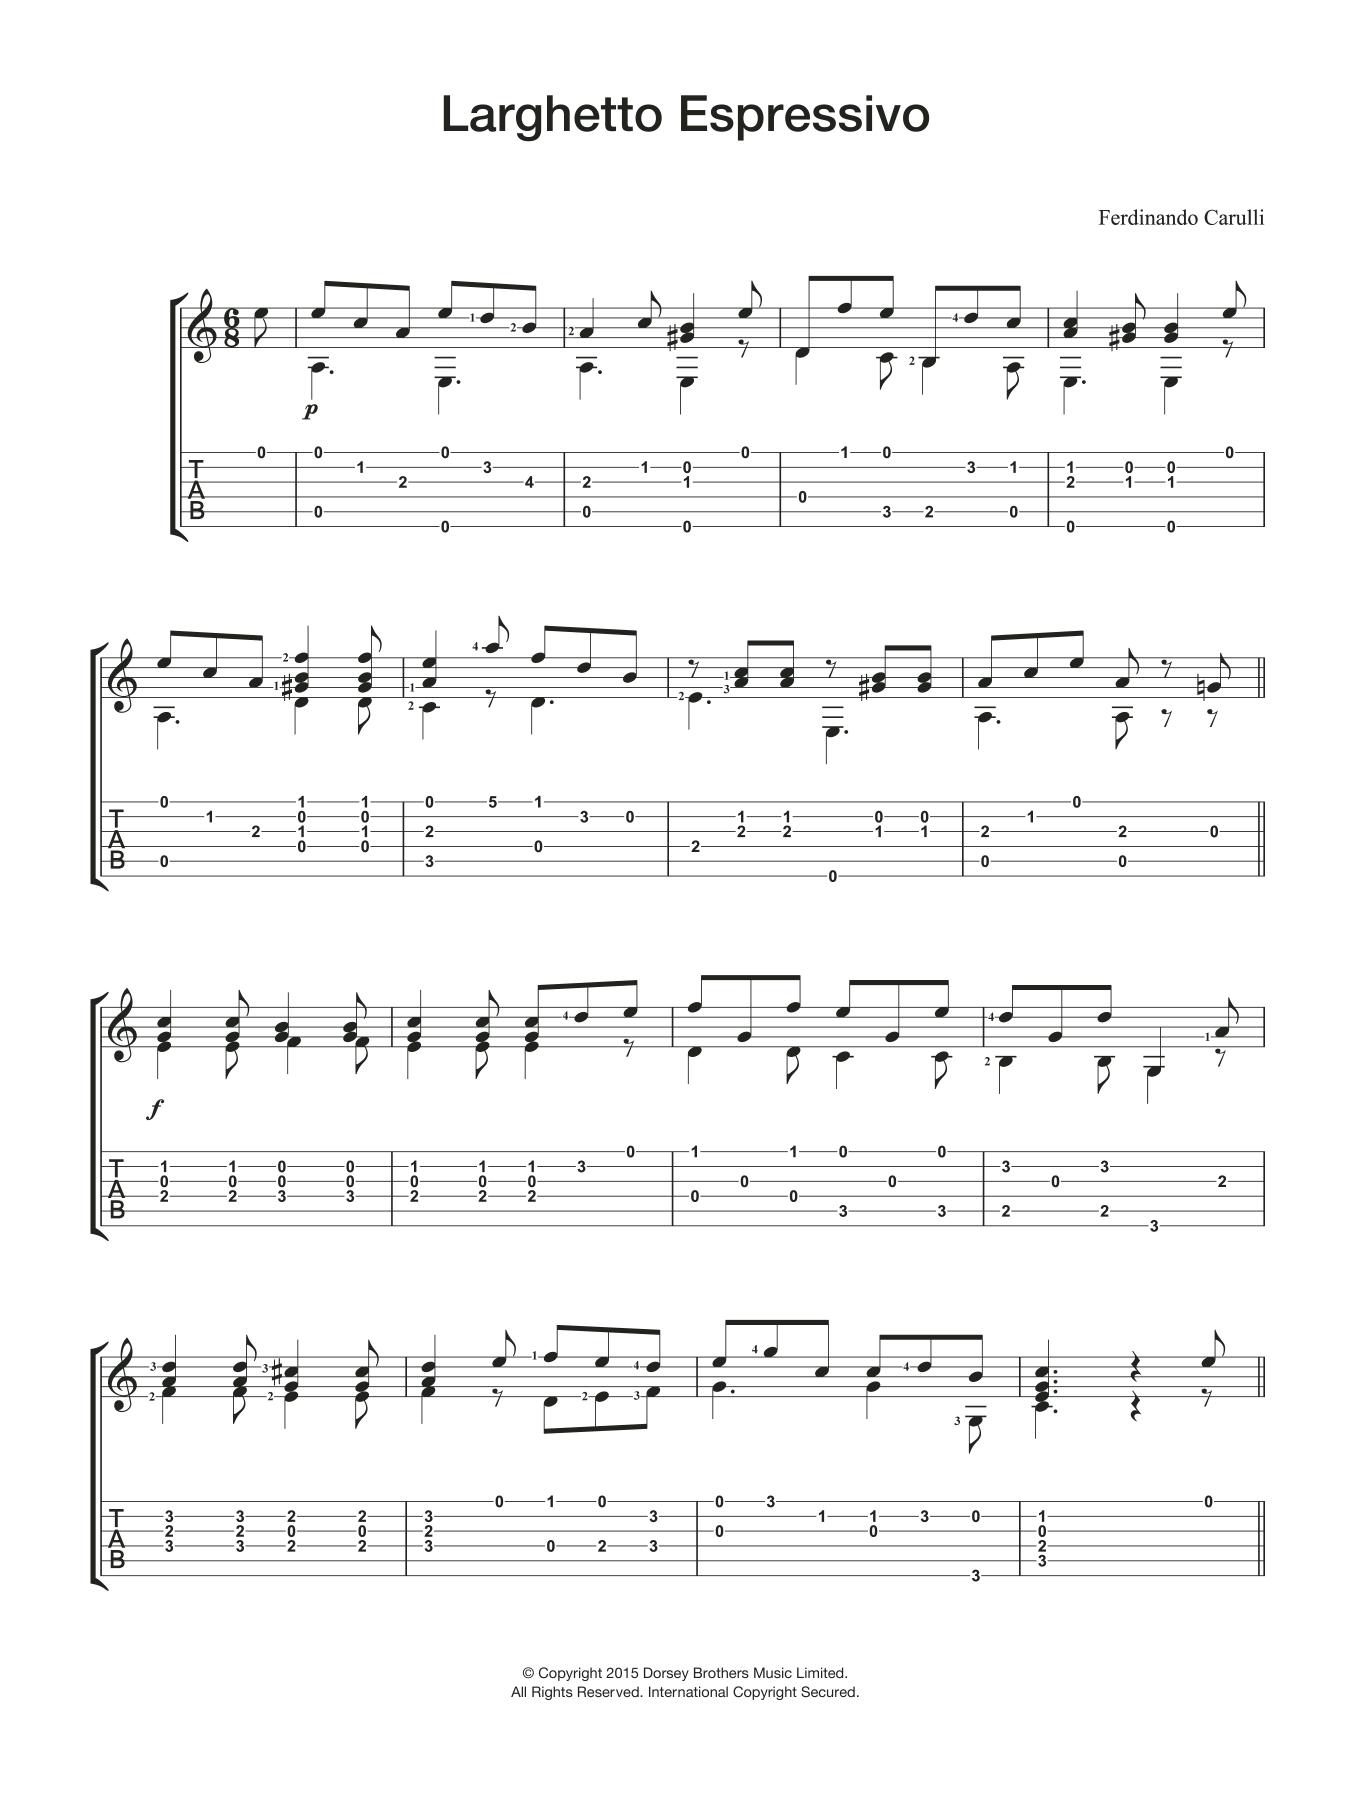 Larghetto Espressivo Sheet Music